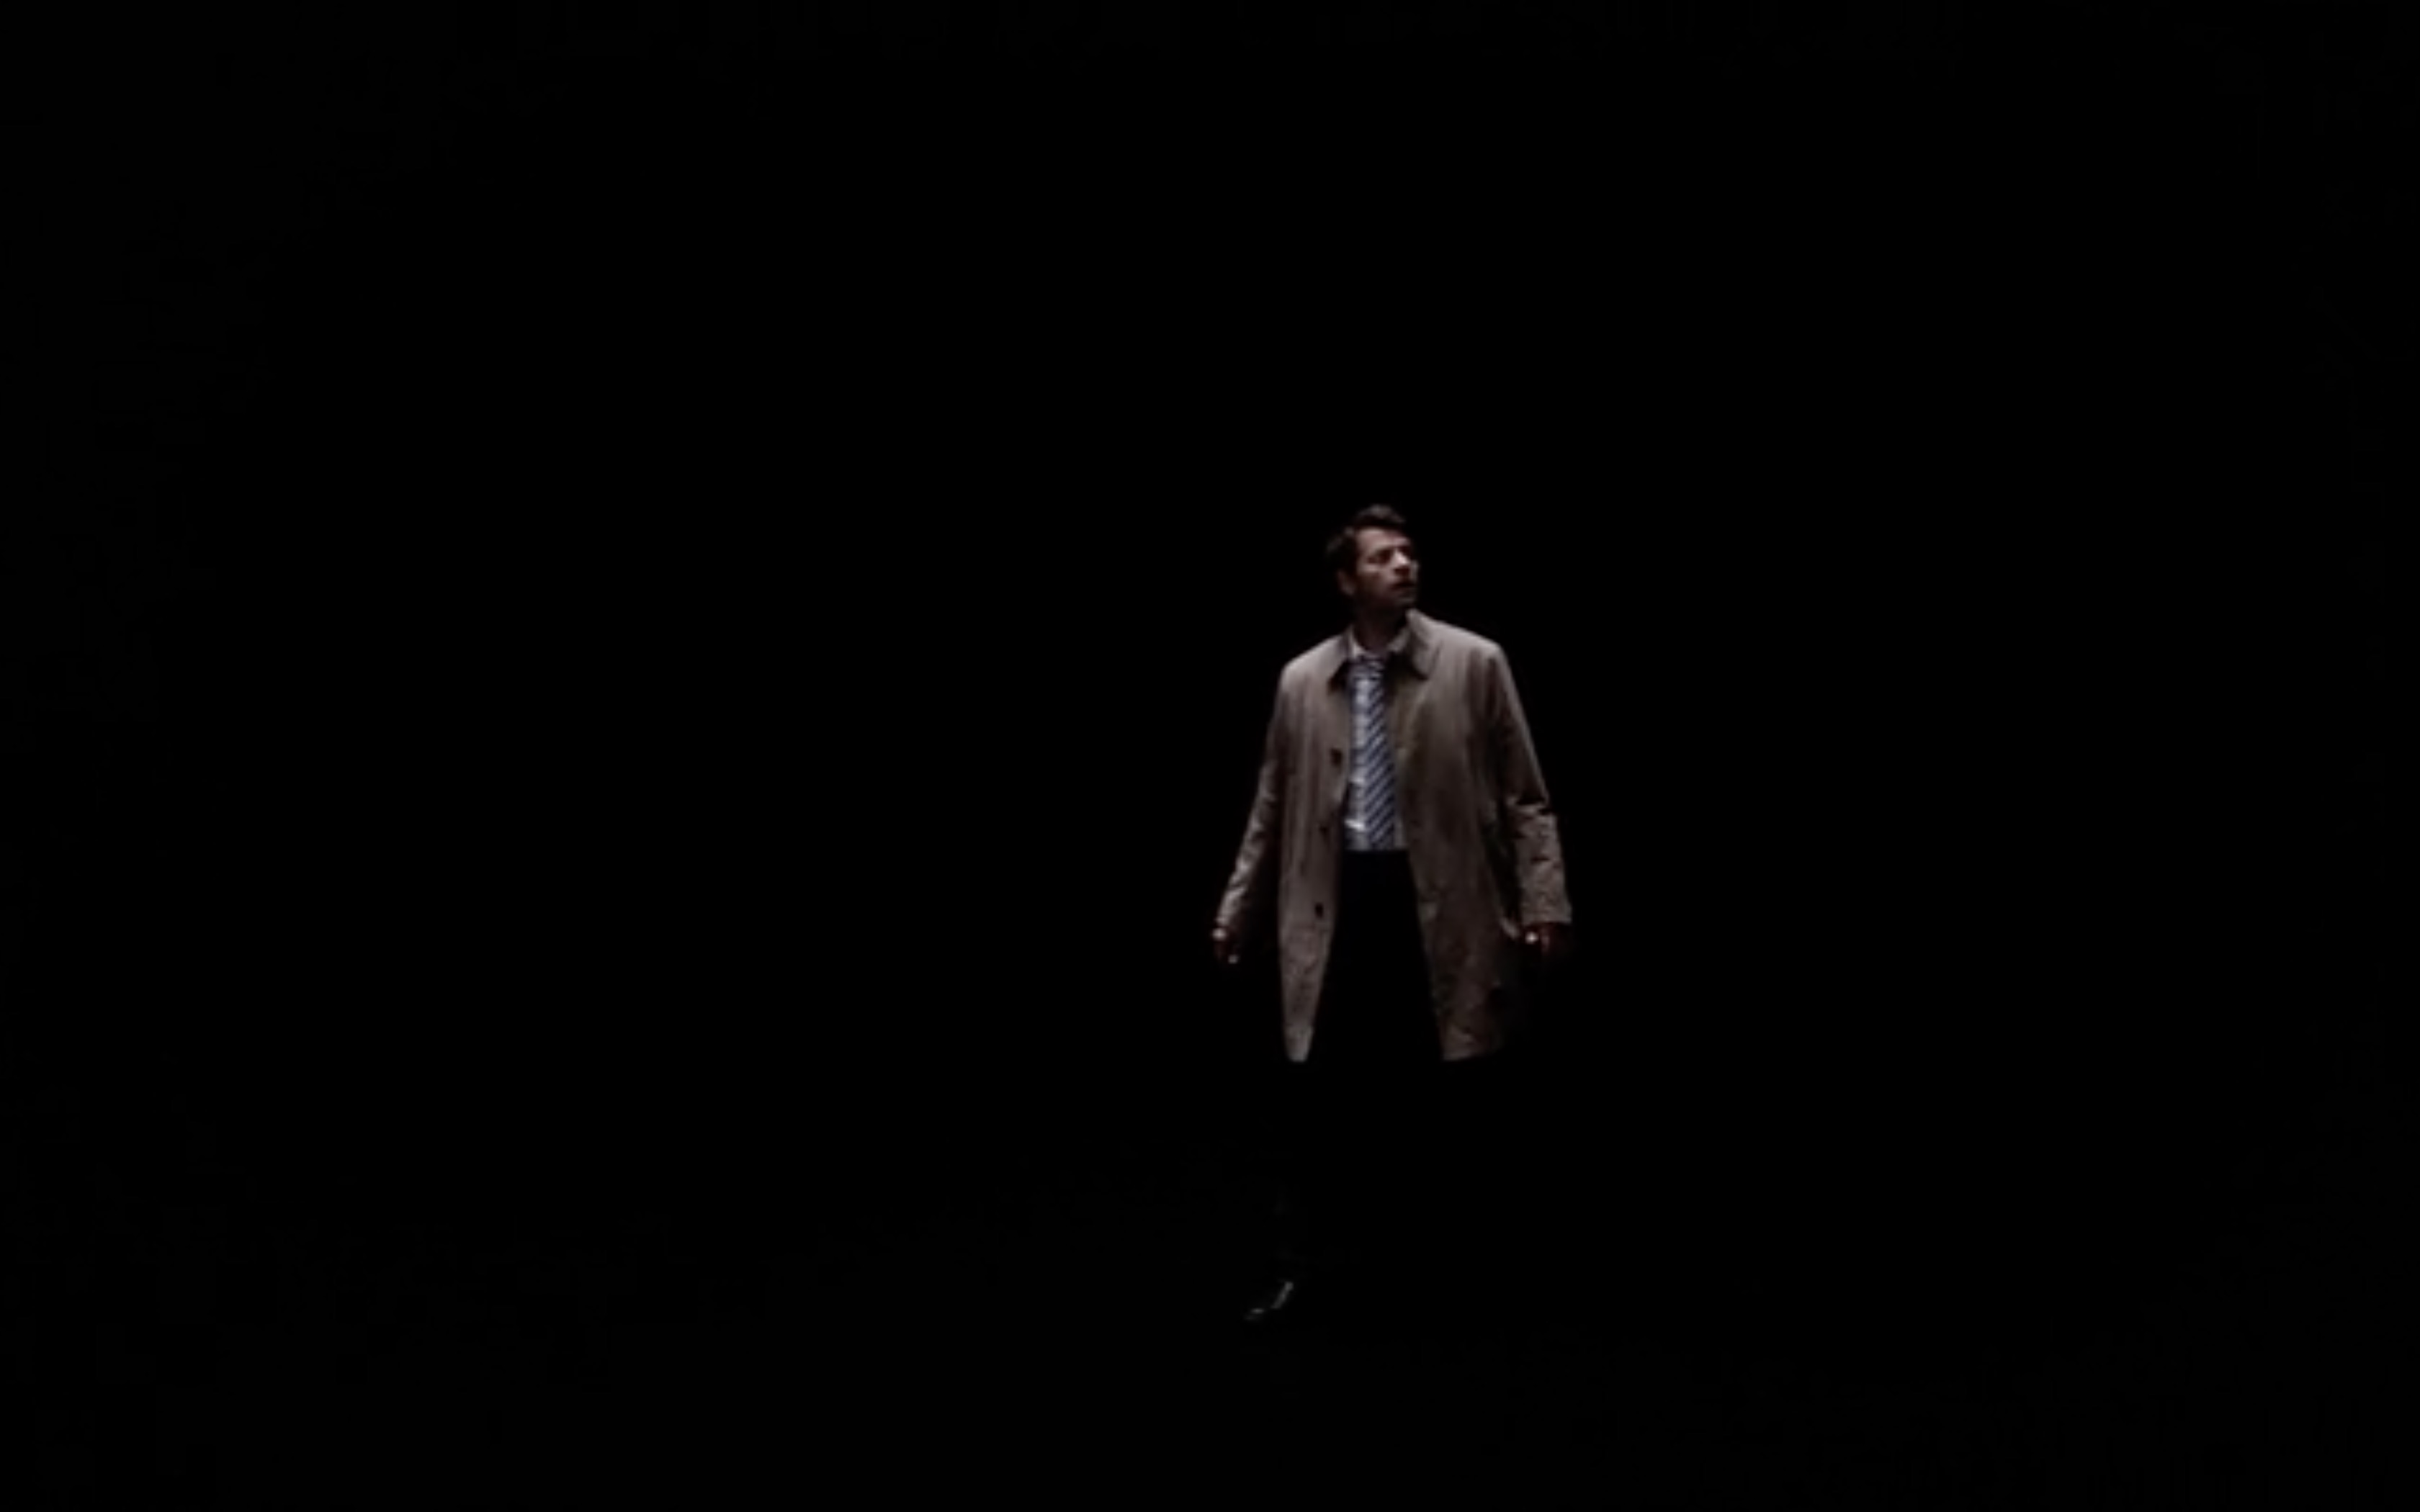 supernatural misha collins castiel being called by jack on big empty